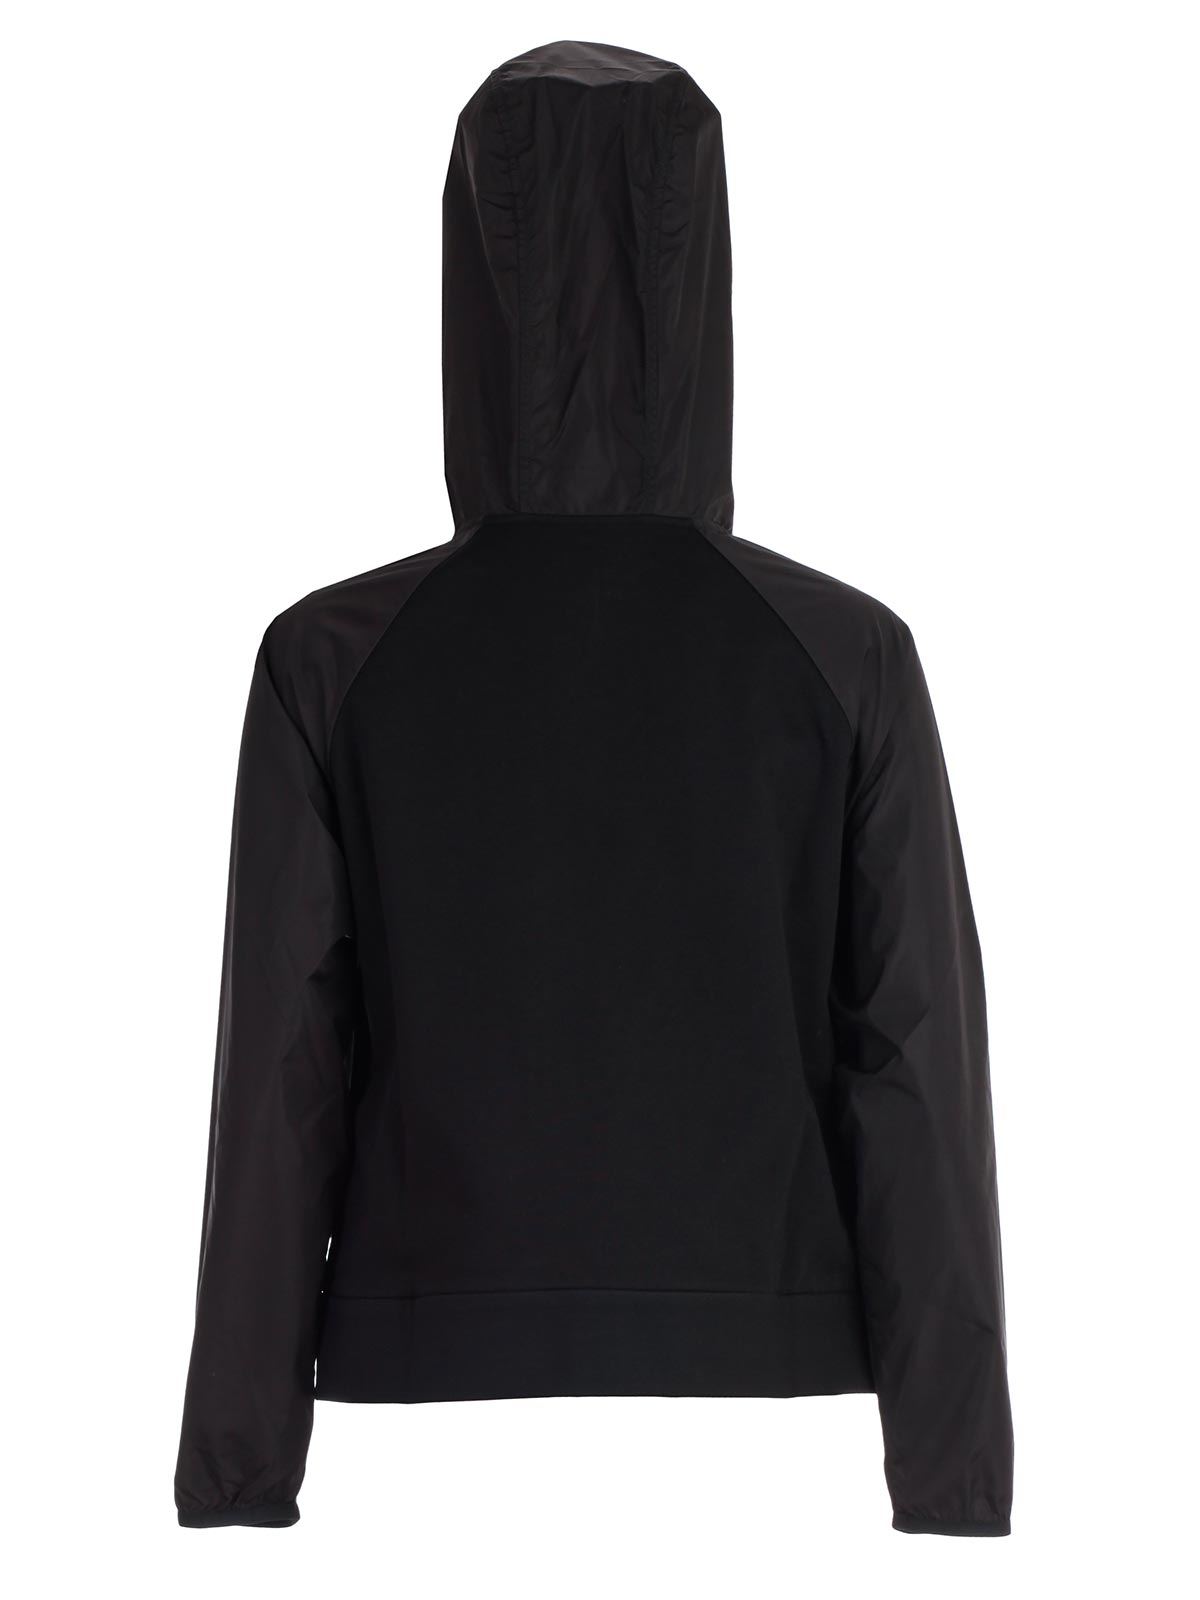 5327d1dbd37b Moncler Genius Sweatshirt 09W.84501.00.809AB - 999 BLACK.Bernardelli ...